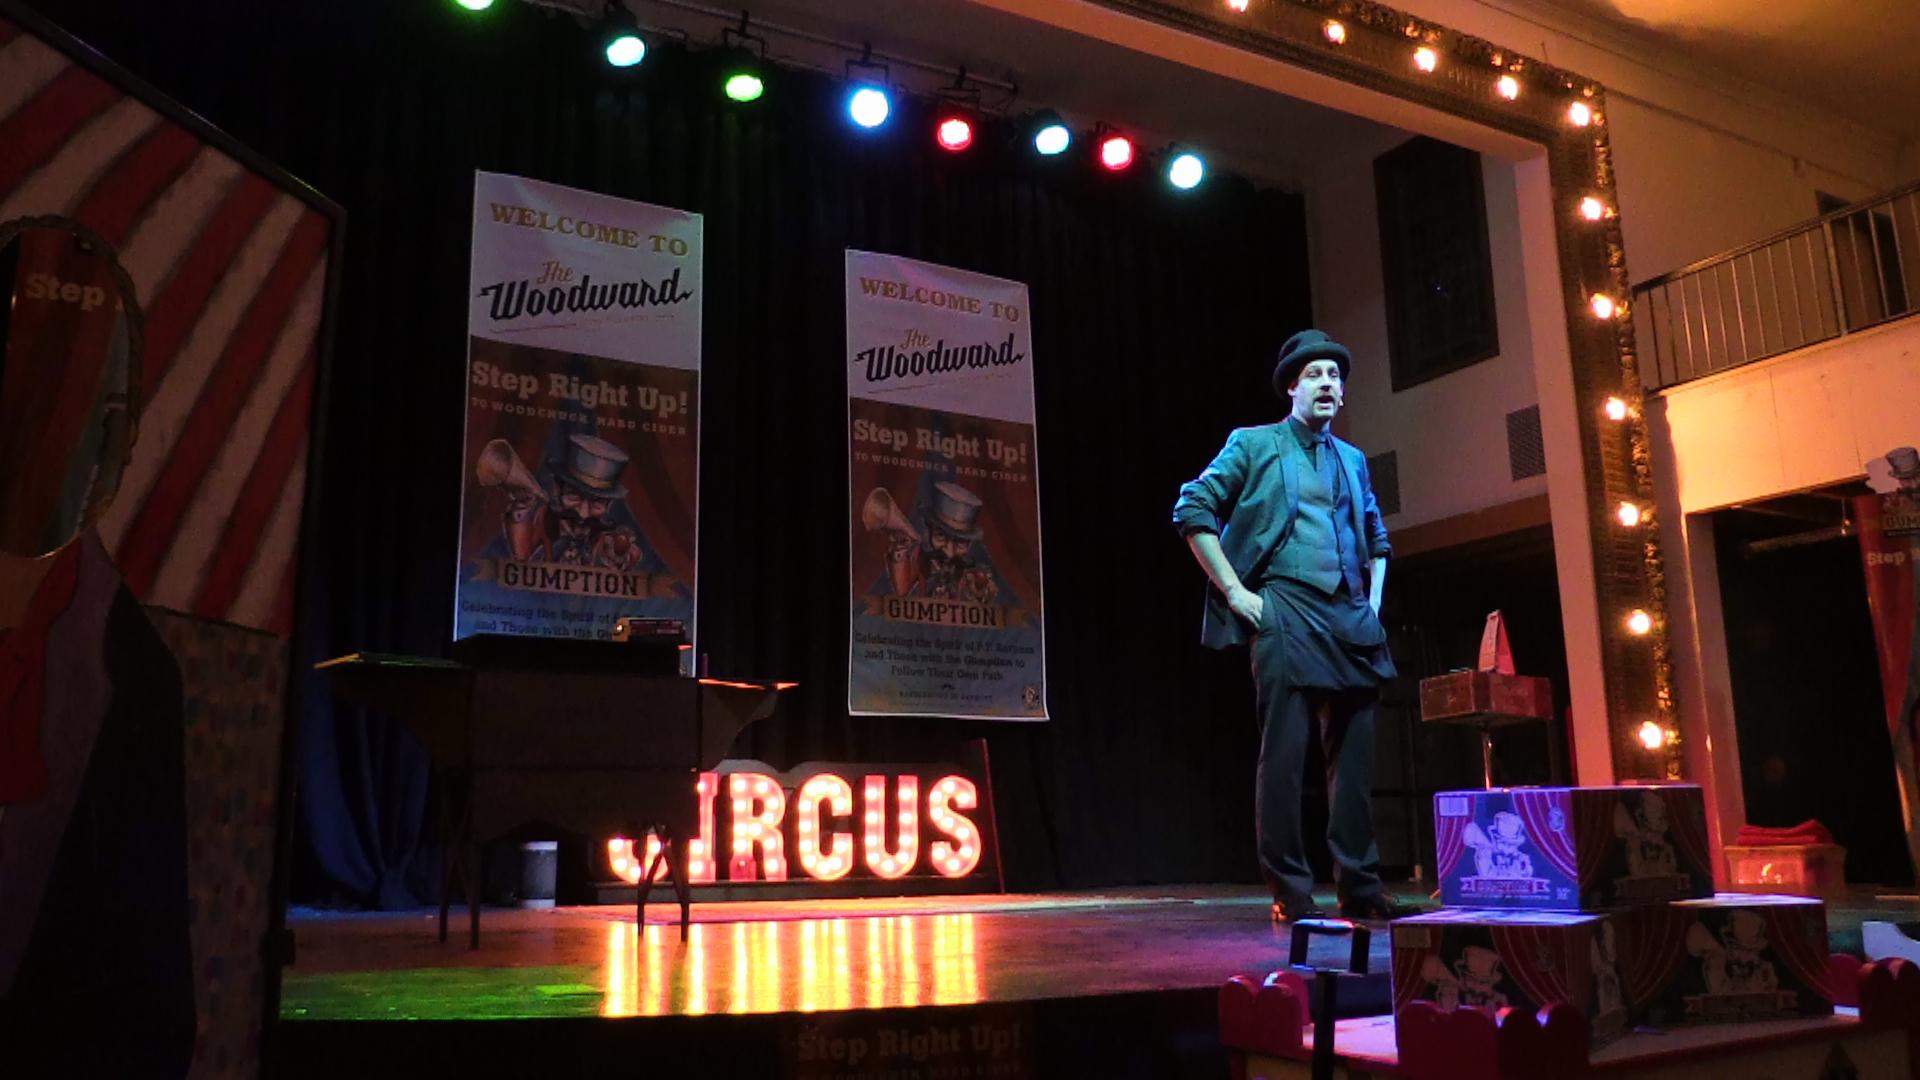 stage show_magic_comedy_circus decor